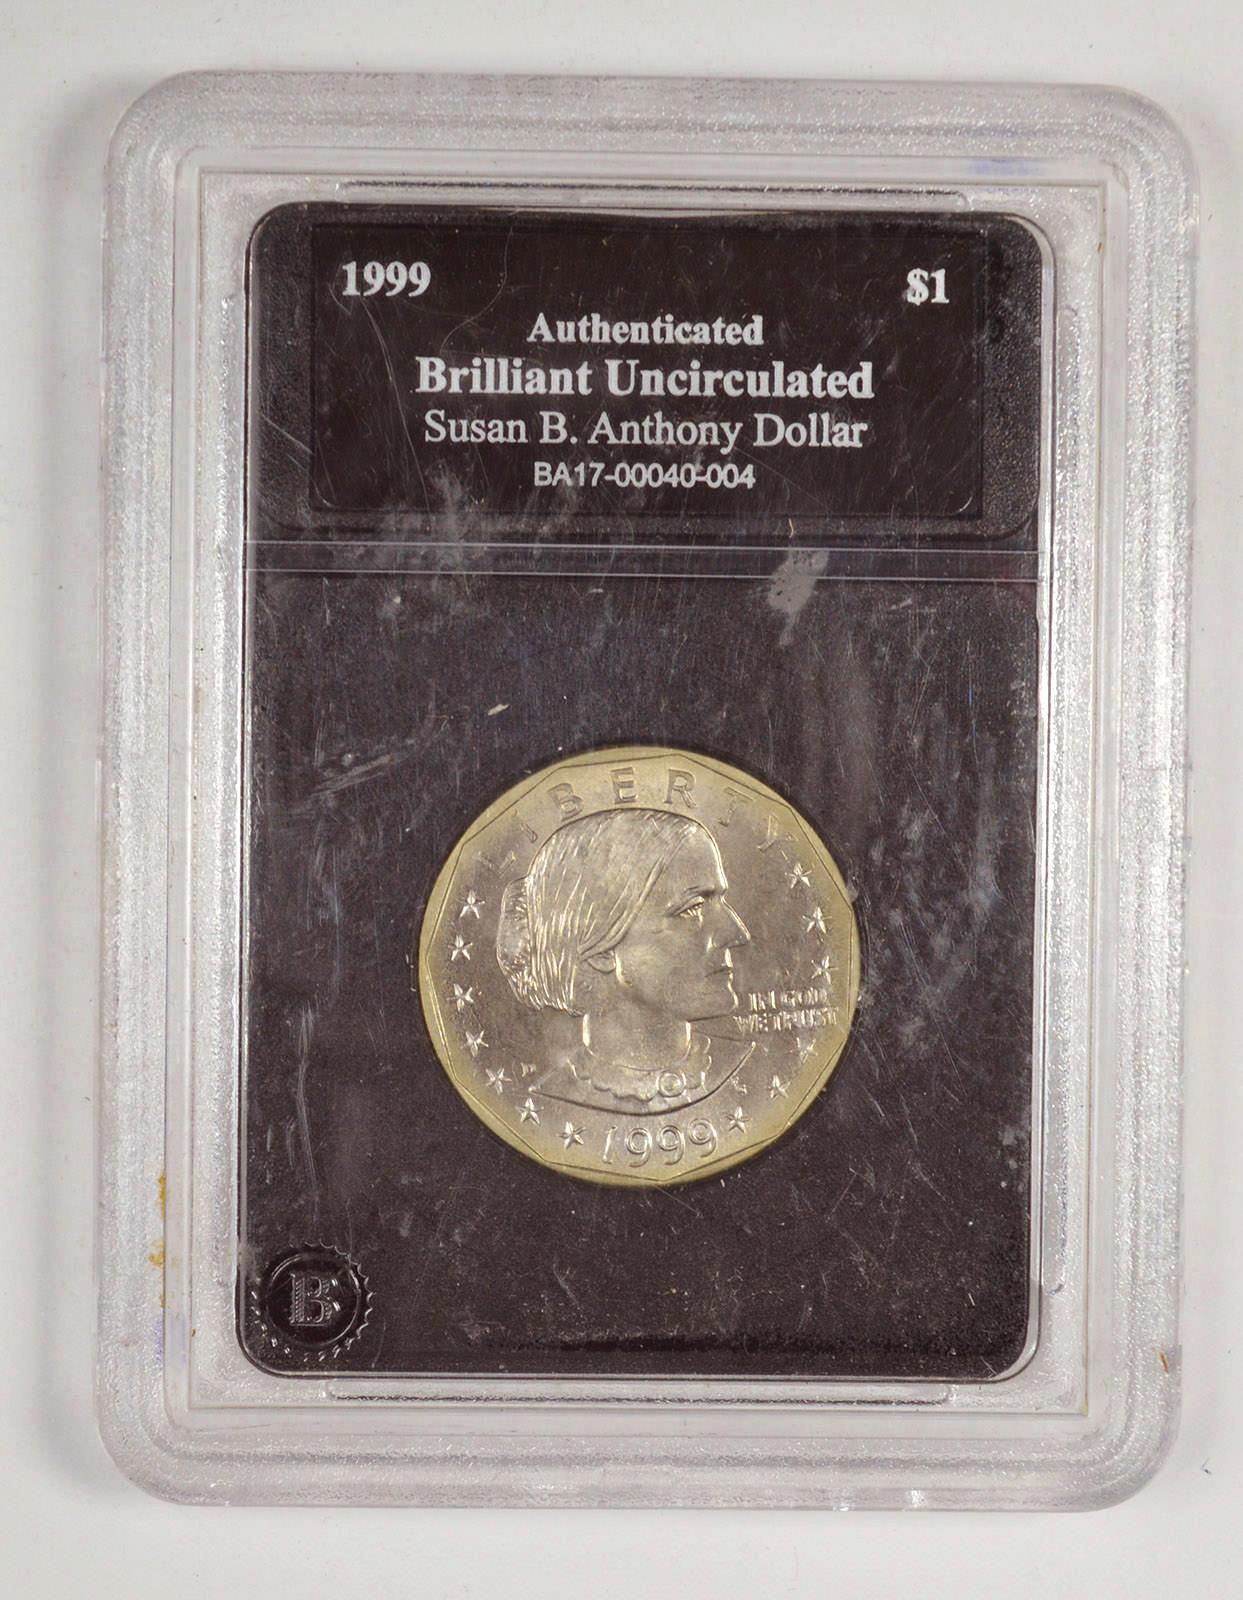 BENIN 1500 CFA 2005 竄ャ parity copper nickel Basel and Piacenza fairs